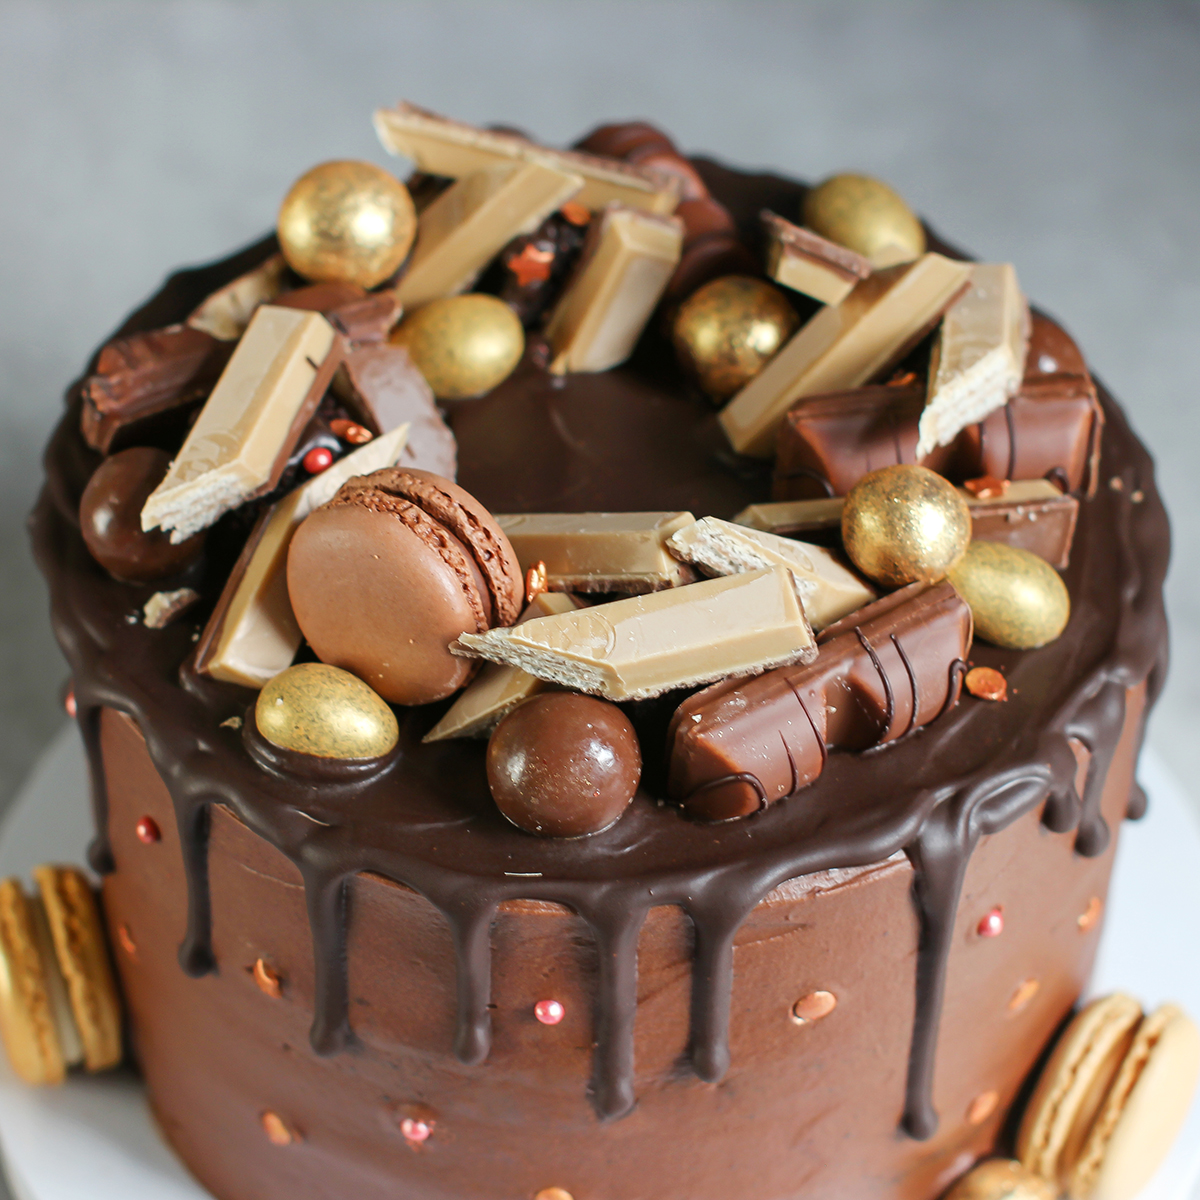 pynt sjokoladekake